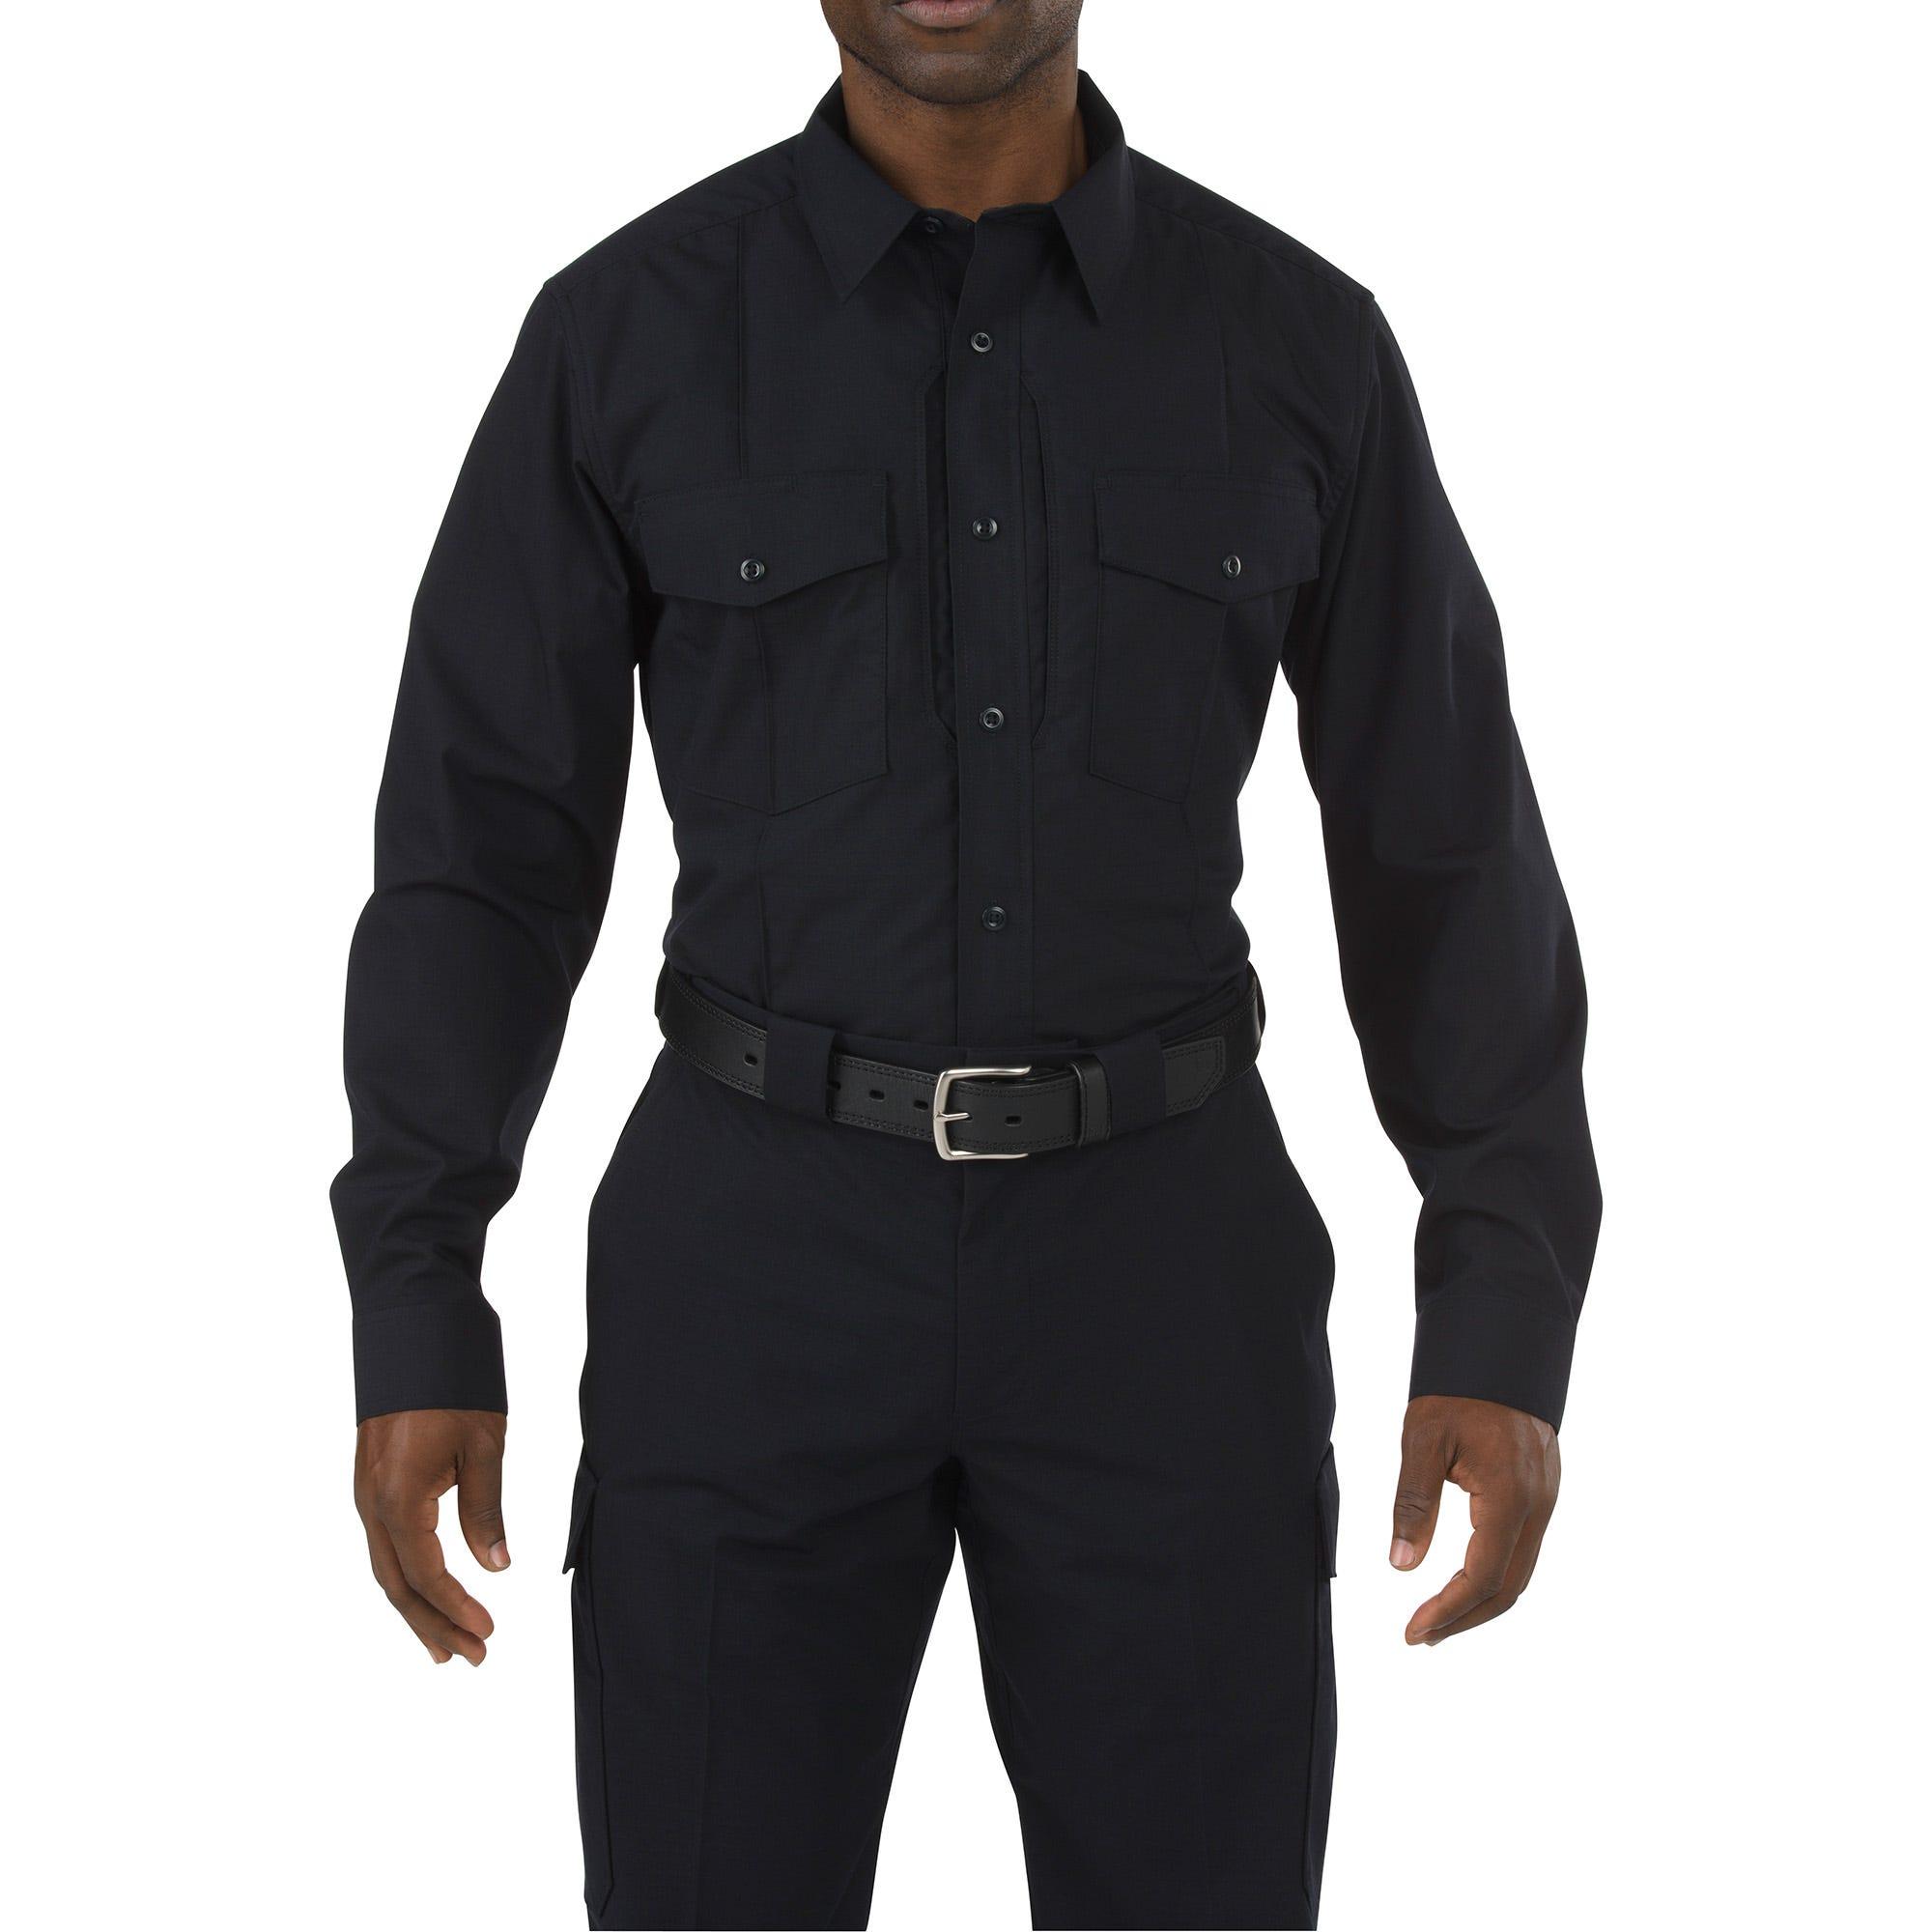 5.11 Stryke™ Class-B PDU® Long Sleeve Shirt